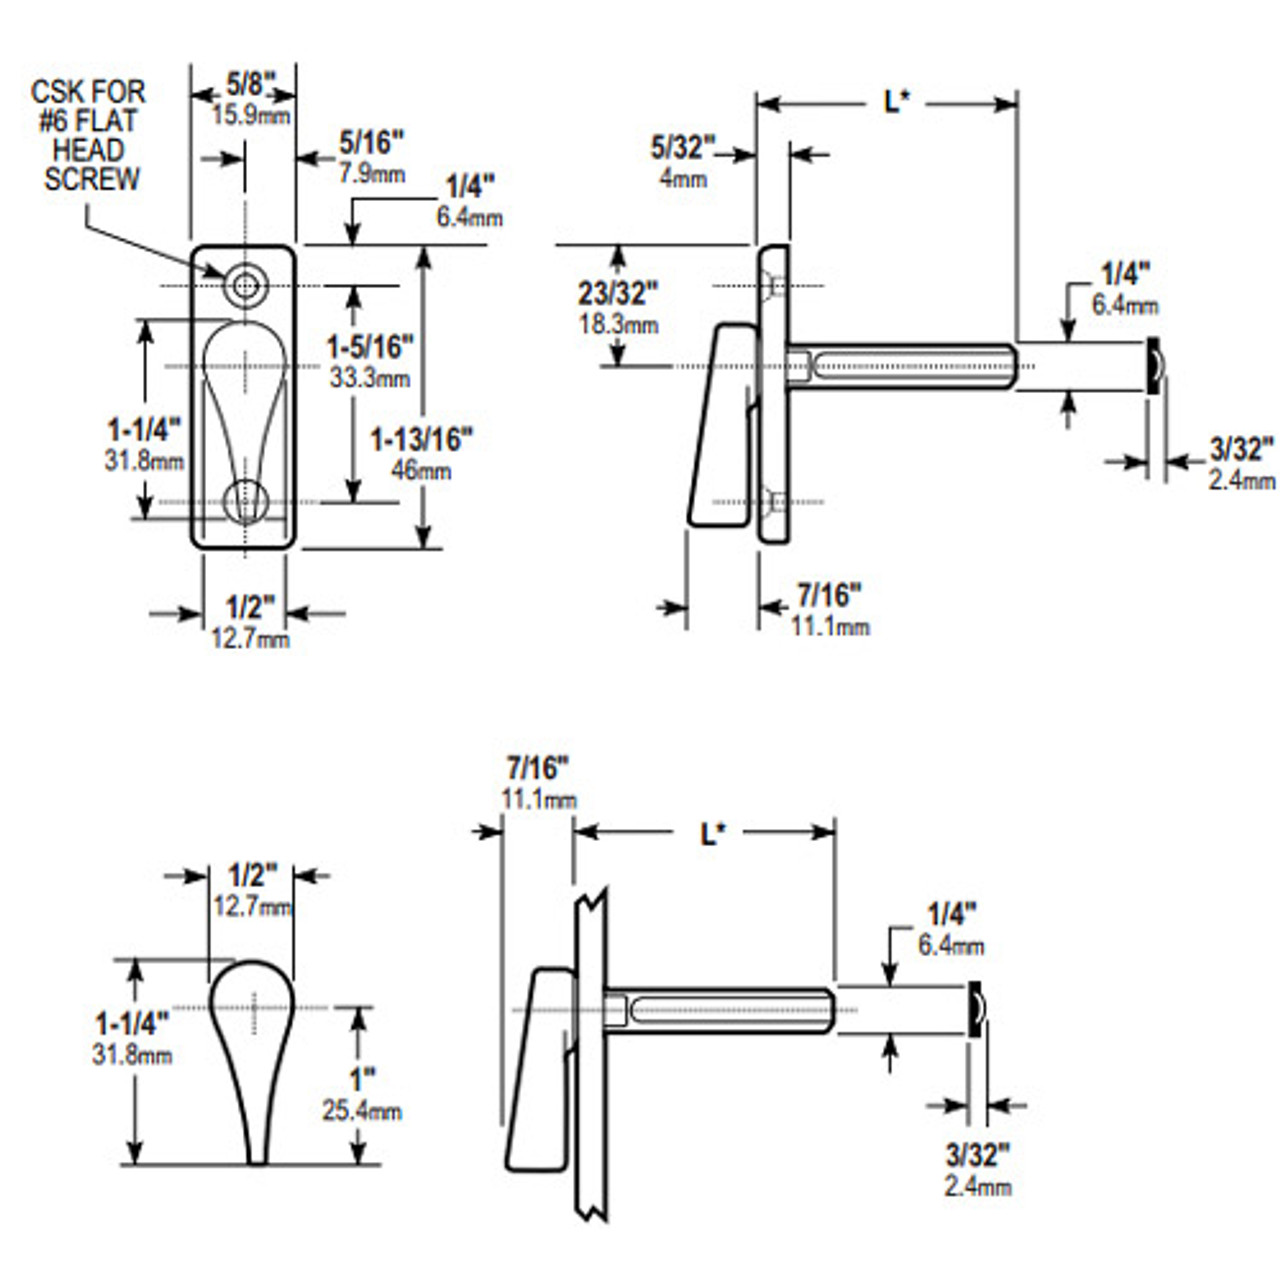 1000-21-21-119 Adams Rite 1000 Series Turns Dimensional View